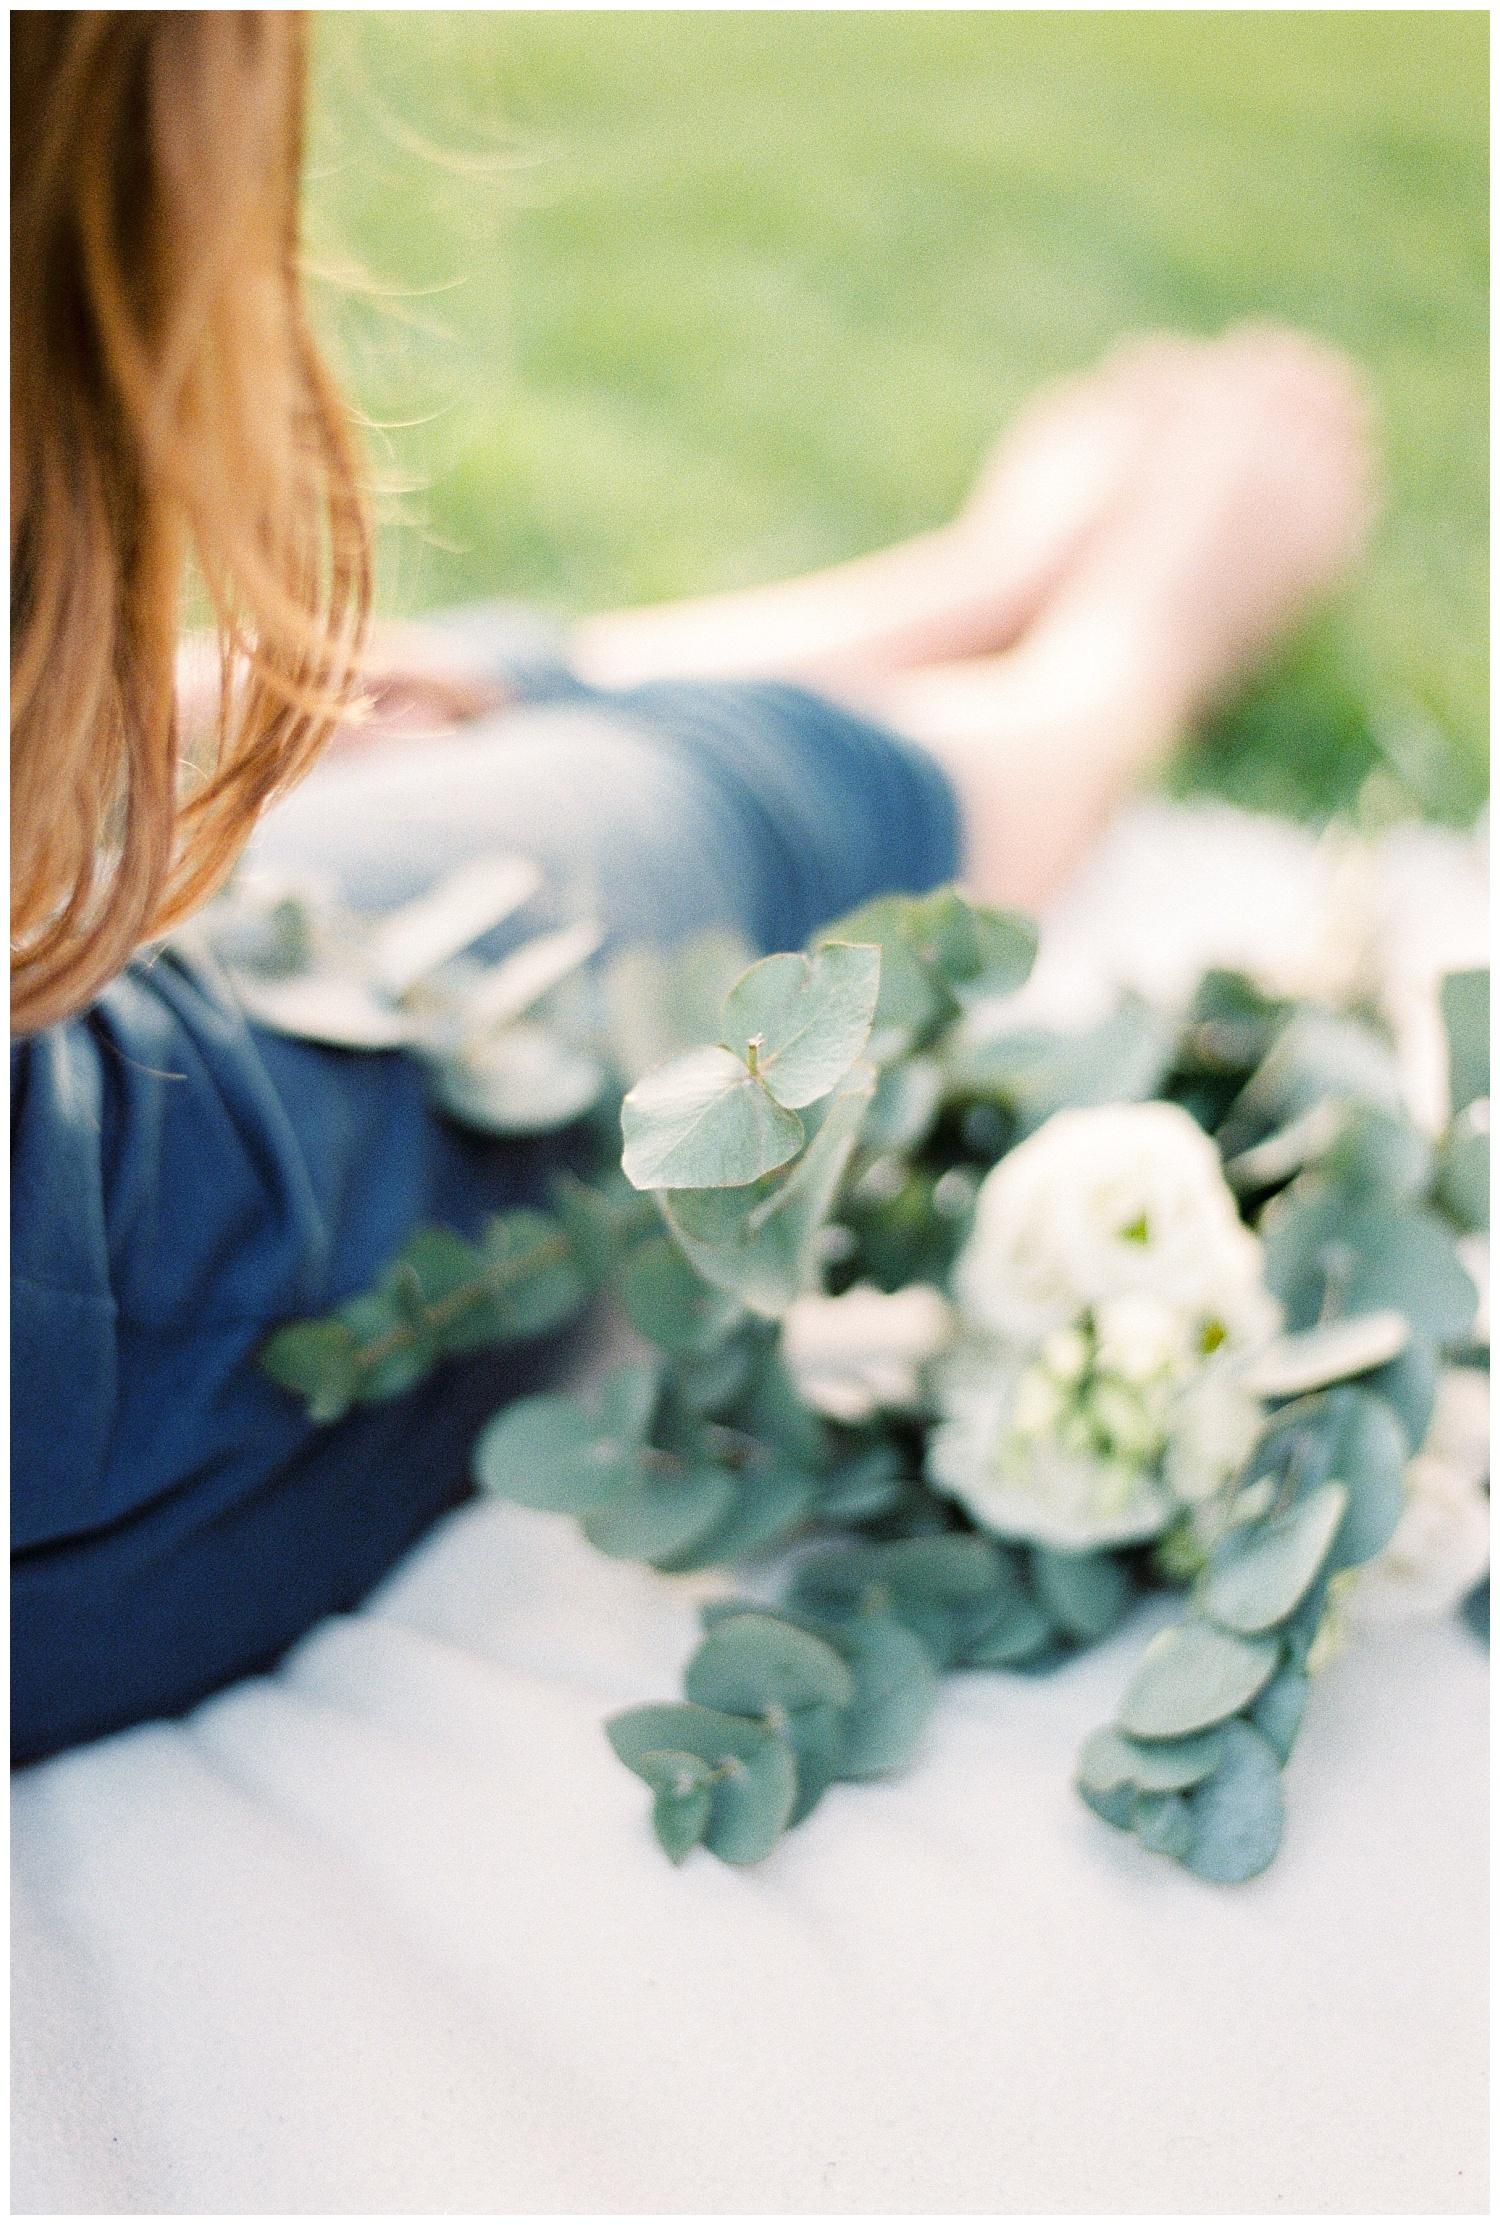 Spring_Gaetan_Jargot_0004.jpg